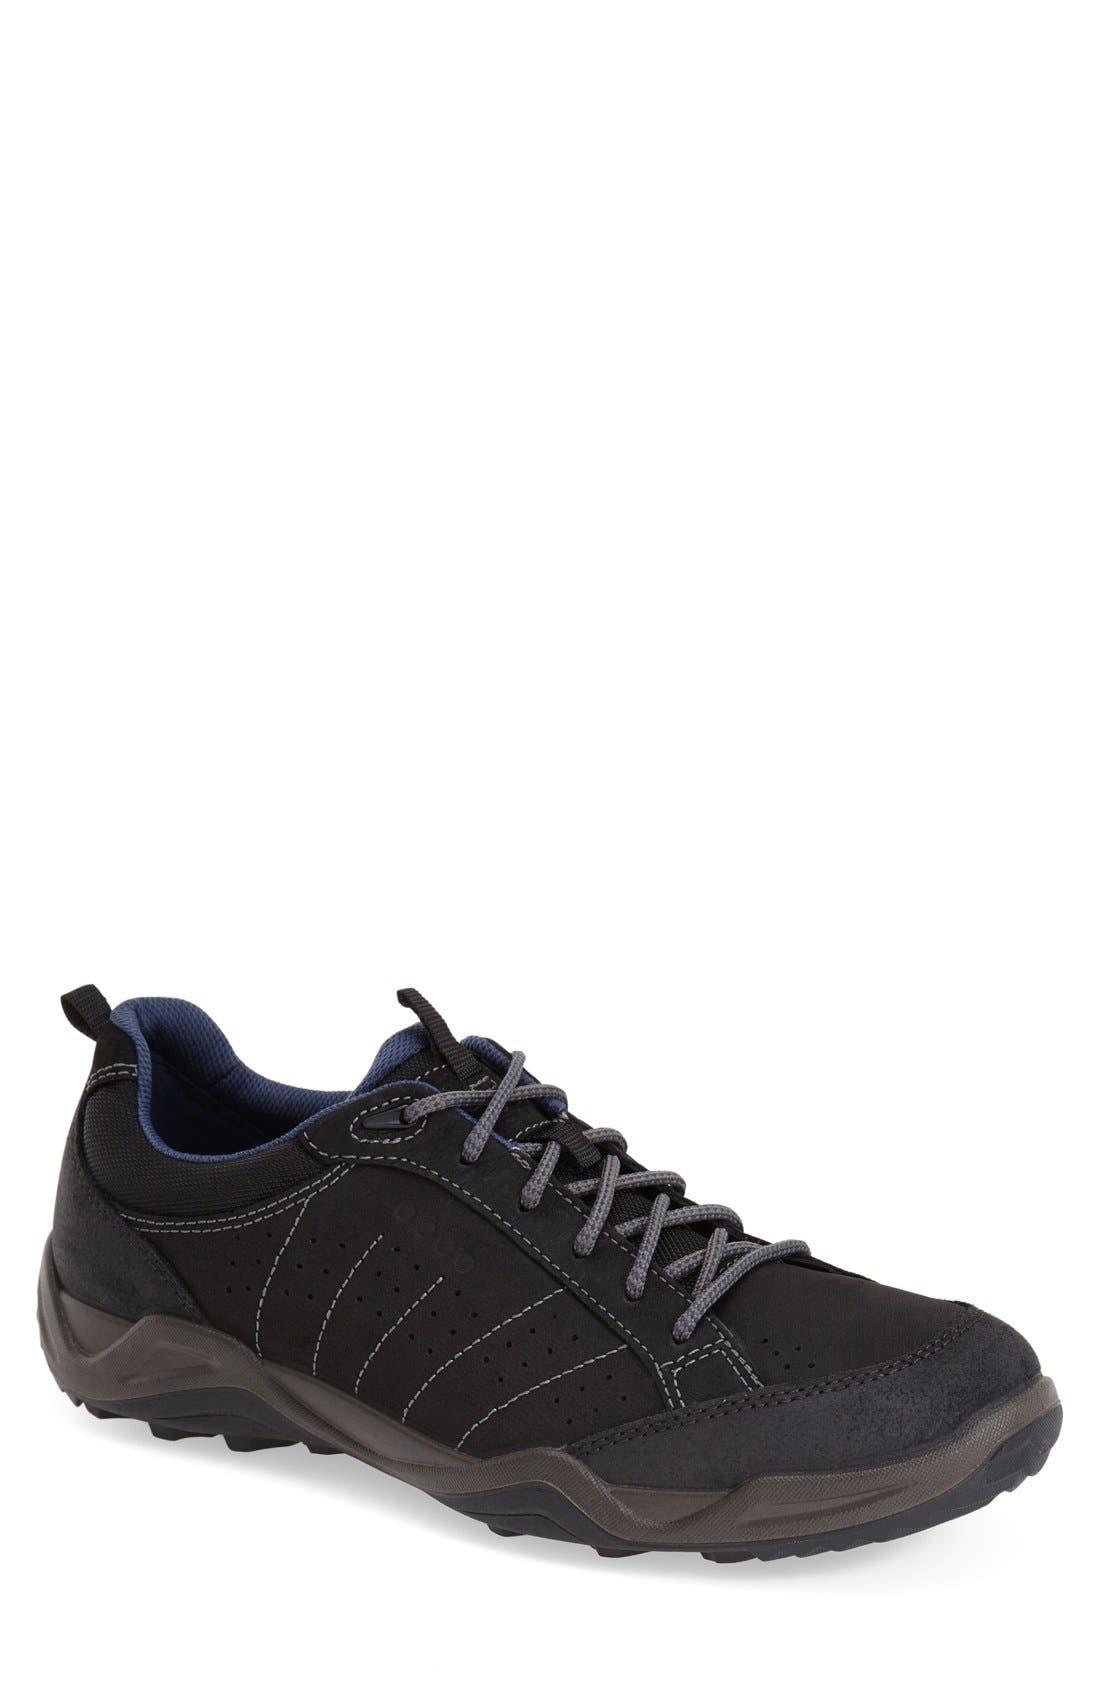 'Sierra II' Sneaker, Main, color, 003